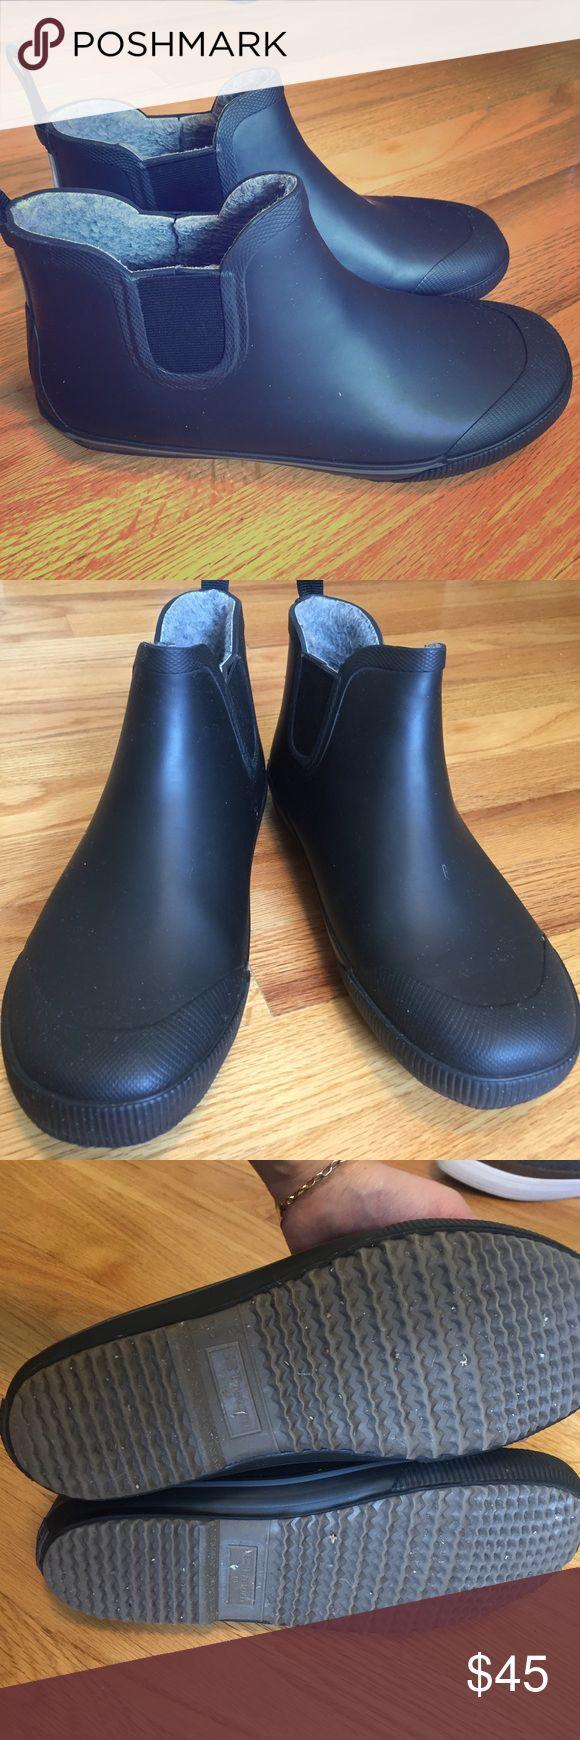 25 best ideas about mens rain boots on pinterest mens hunter boots men 39 s boots and men shoes. Black Bedroom Furniture Sets. Home Design Ideas